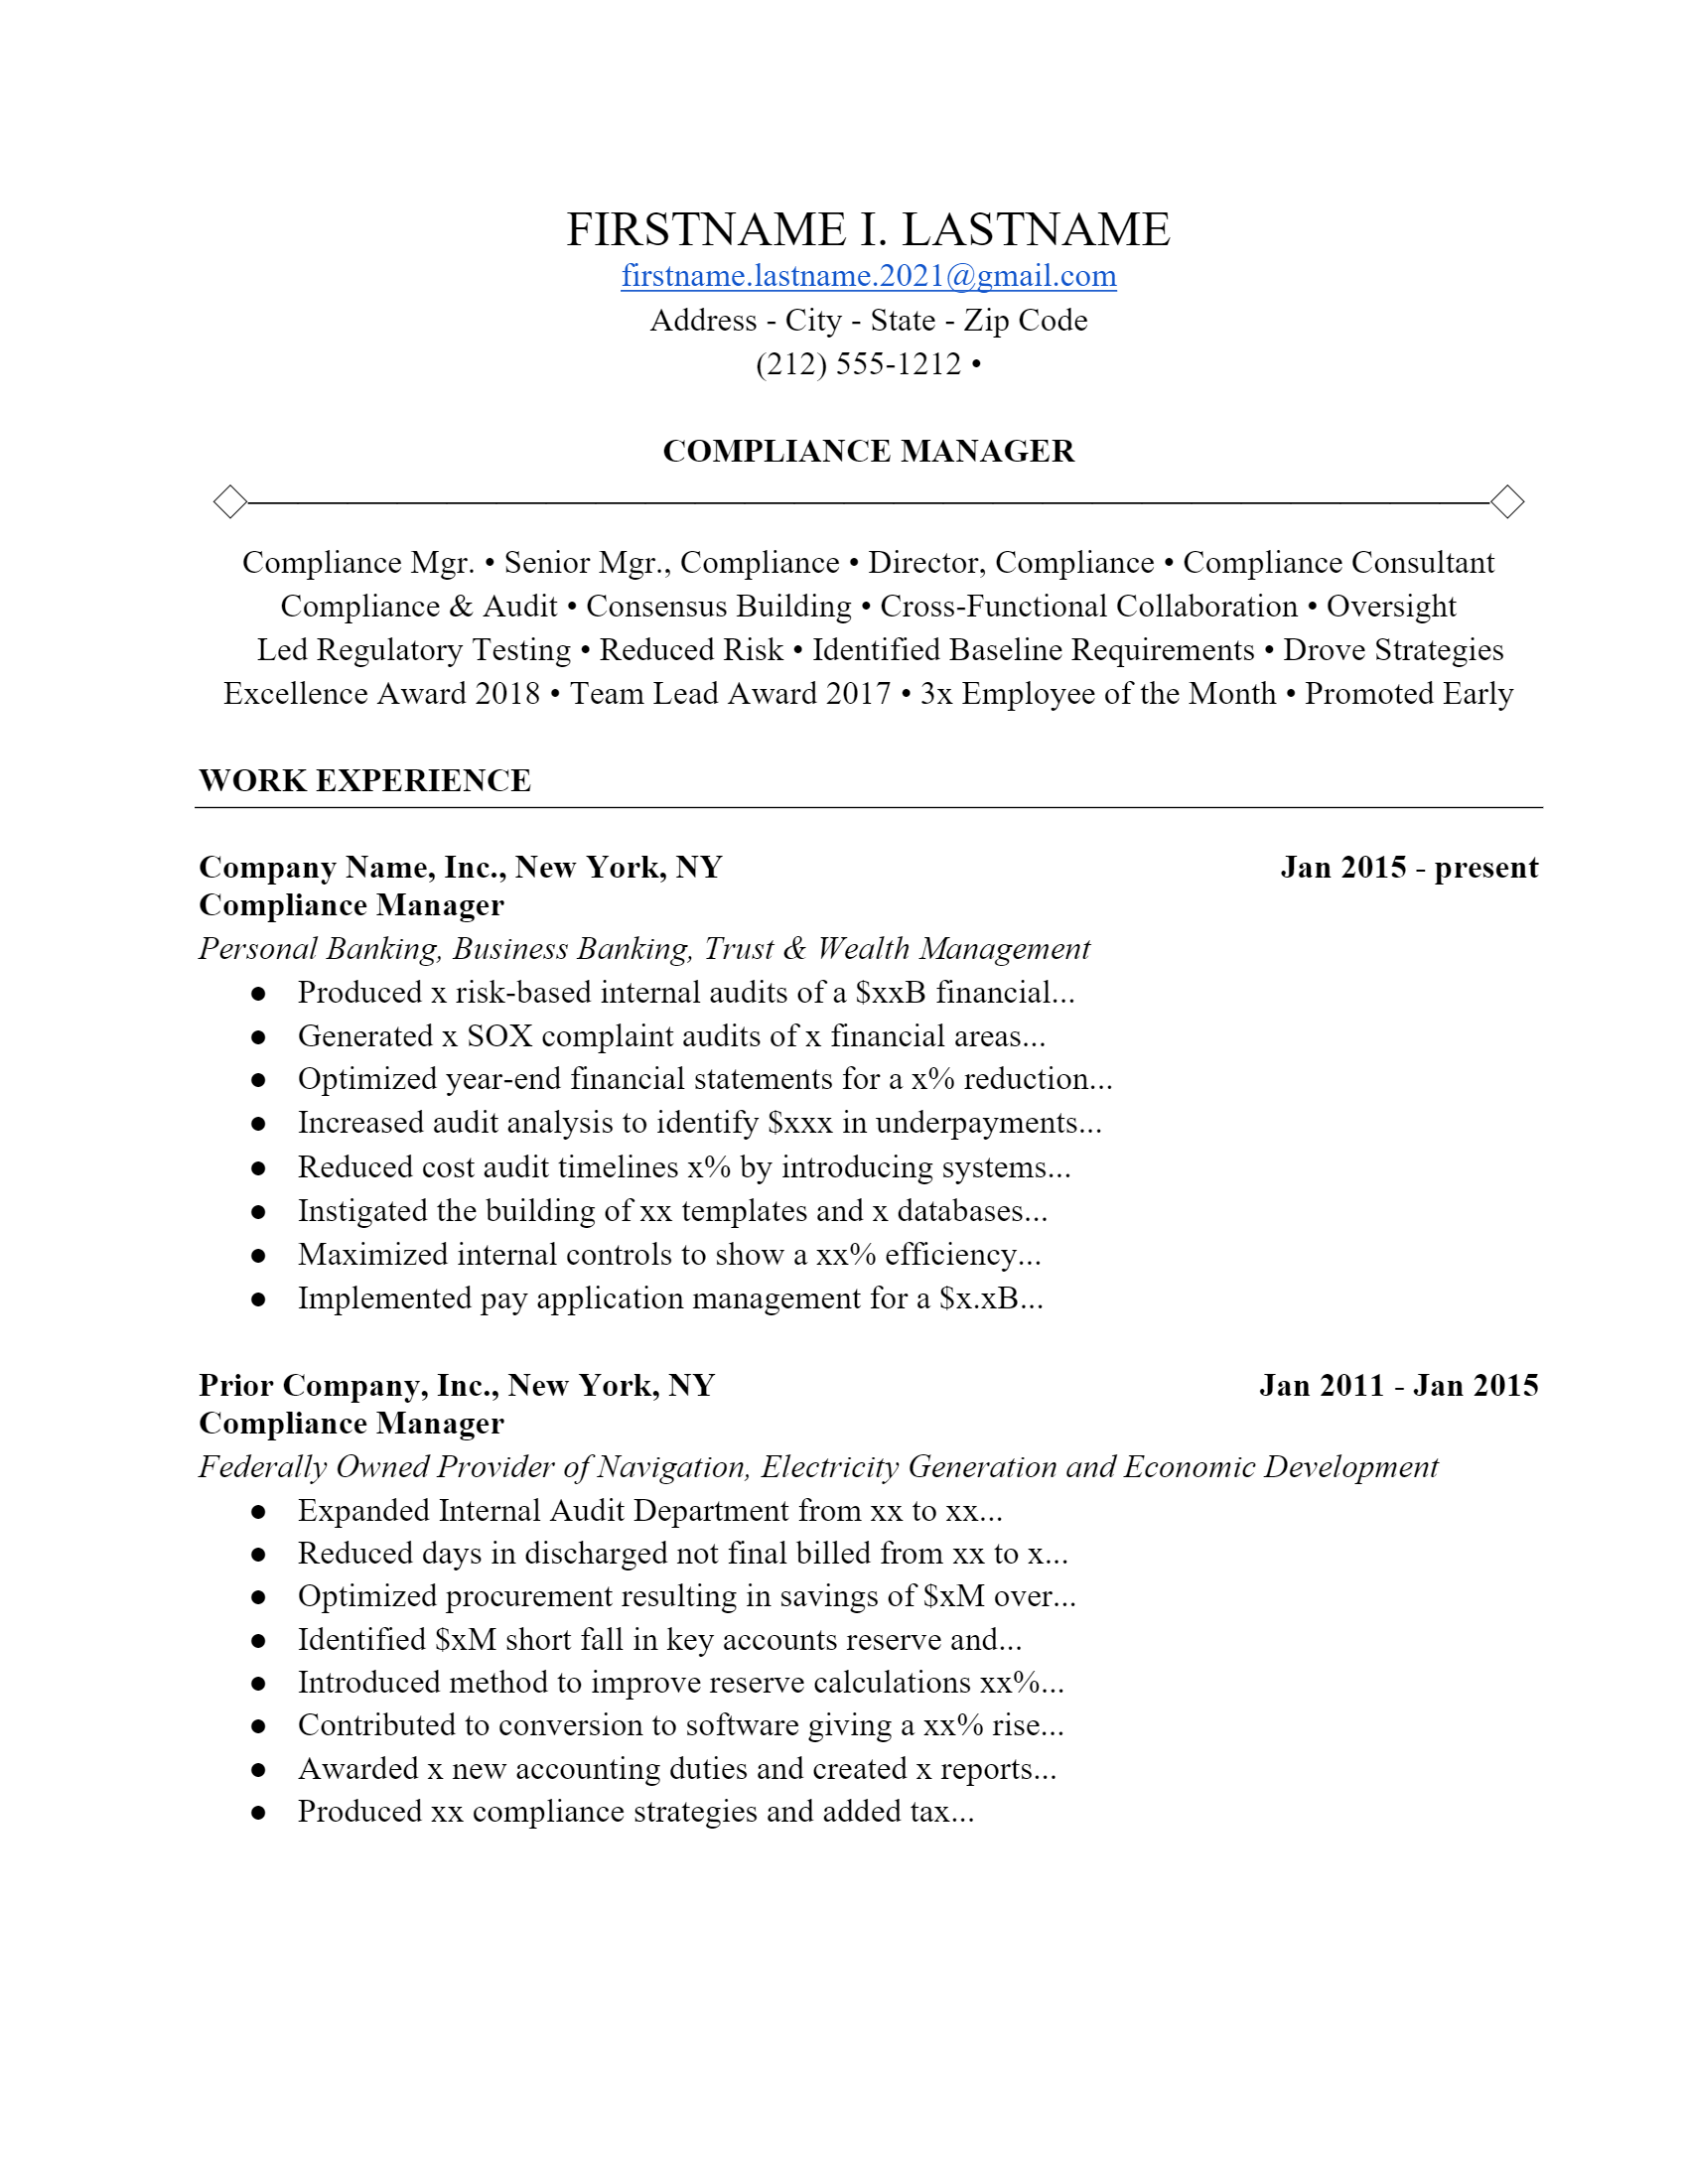 Auditing Resume > Auditing Resume .Docx (Word)